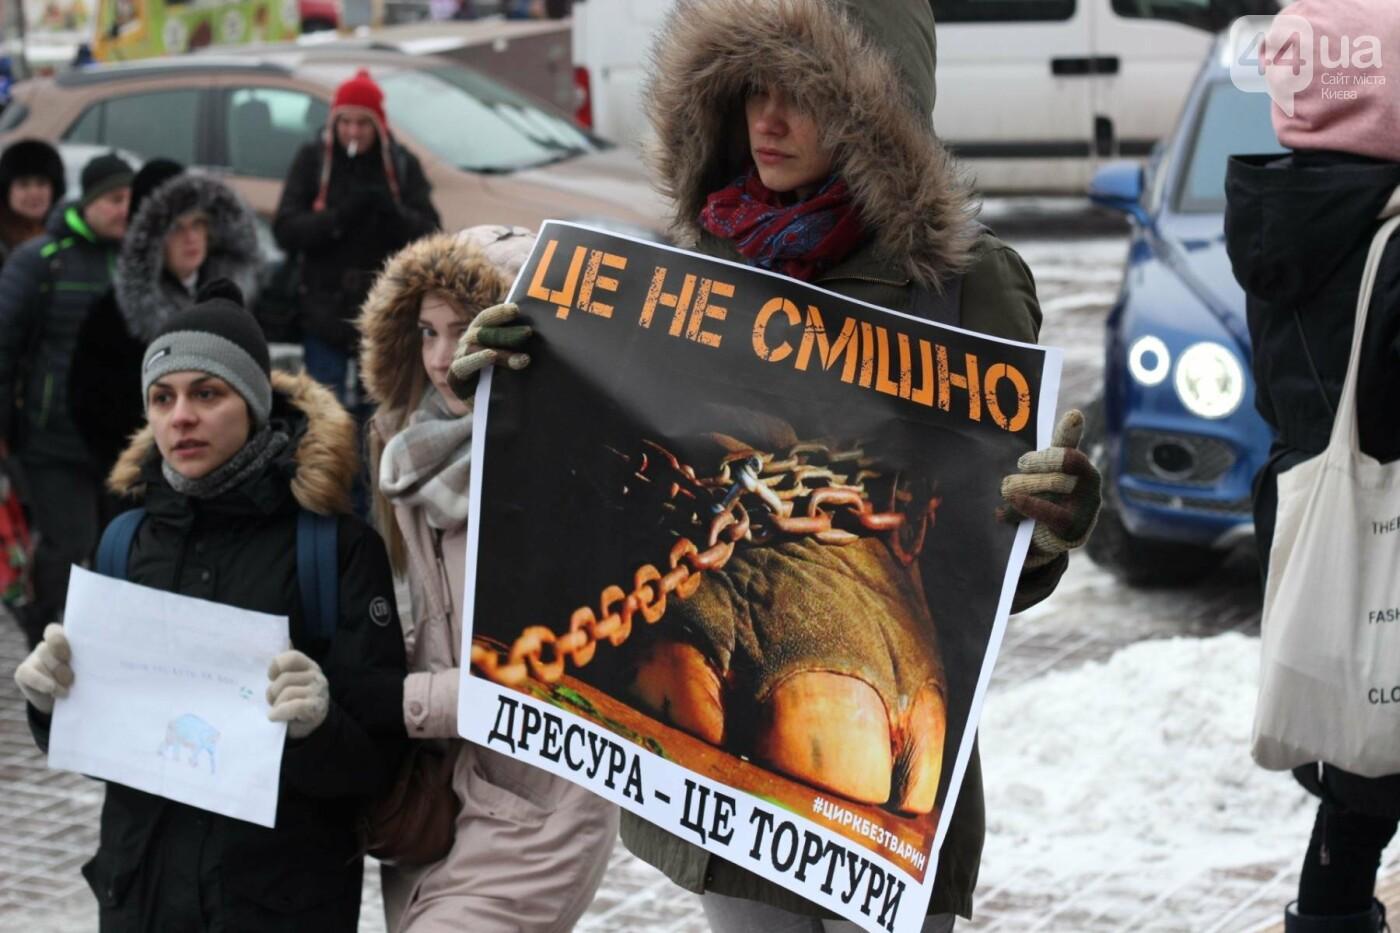 Цирк без животных: как в Киеве прошла акция протеста, фото-35